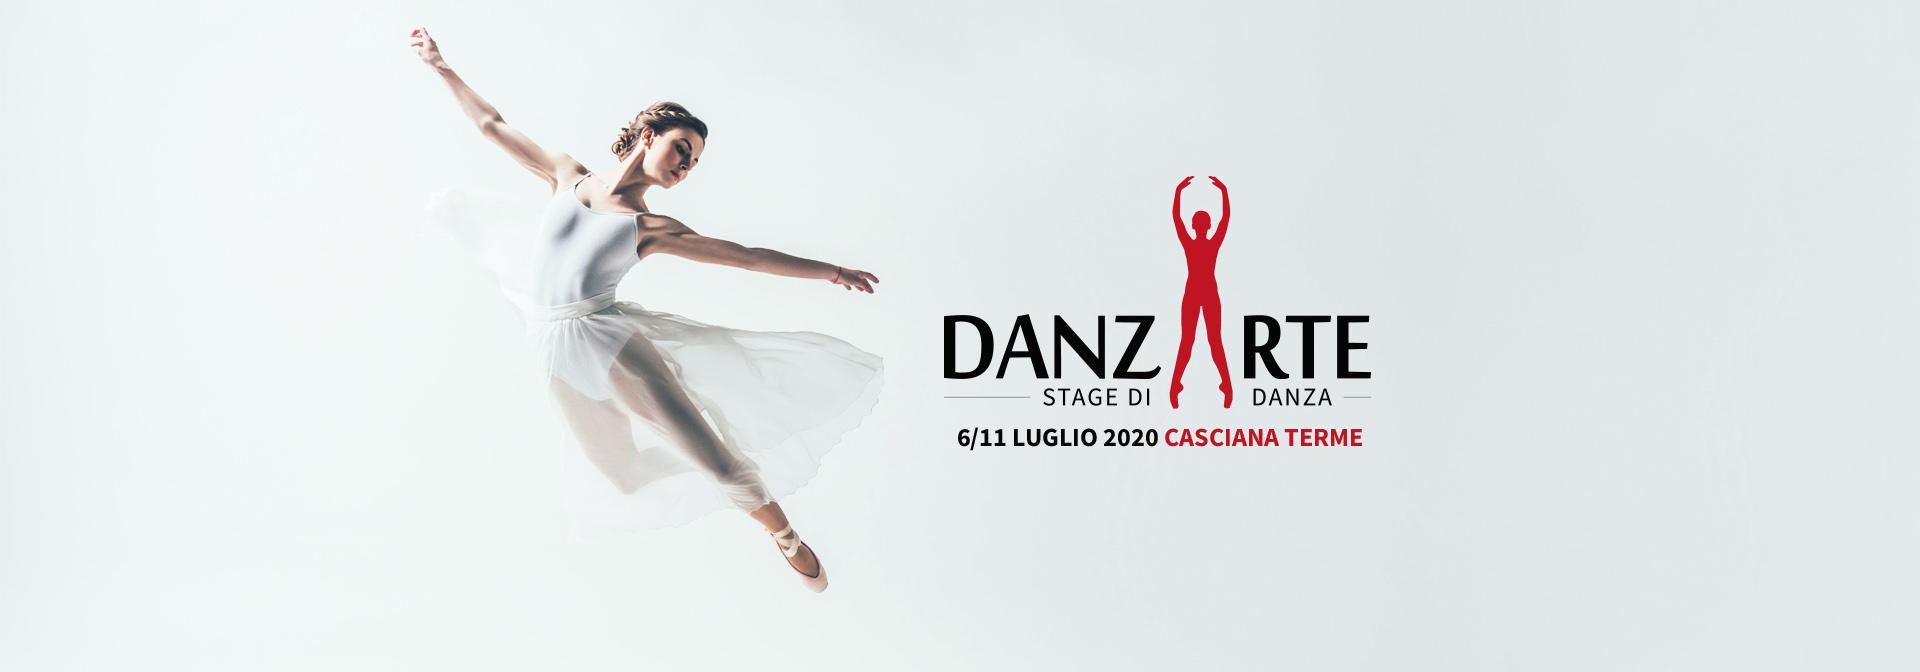 DanzArte Casciana Terme 2020